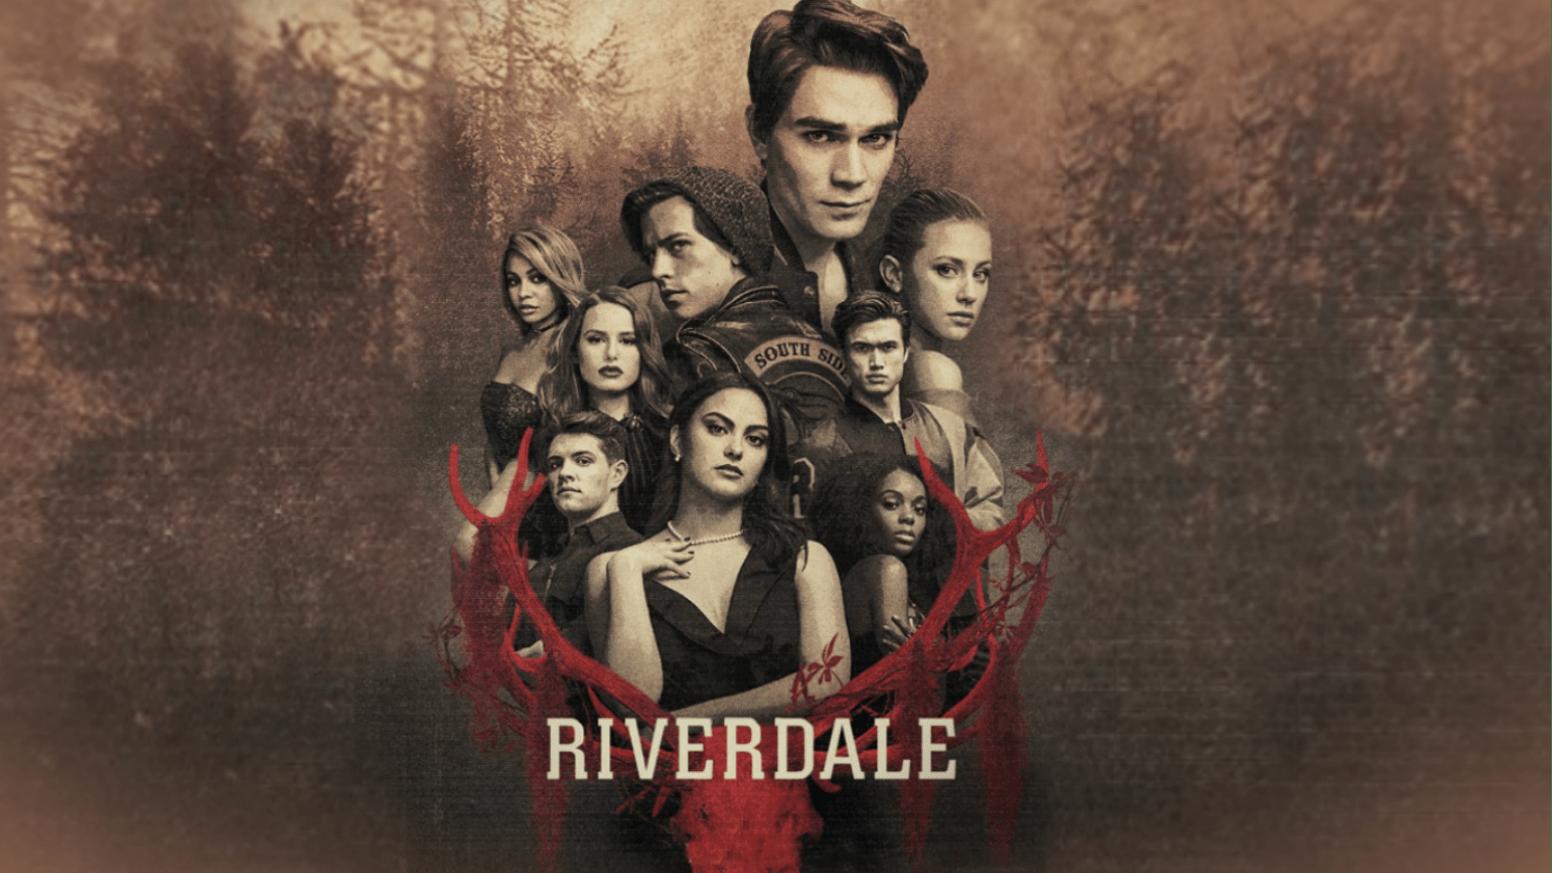 Riverdale Desktop Wallpapers Top Free Riverdale Desktop Backgrounds Wallpaperaccess